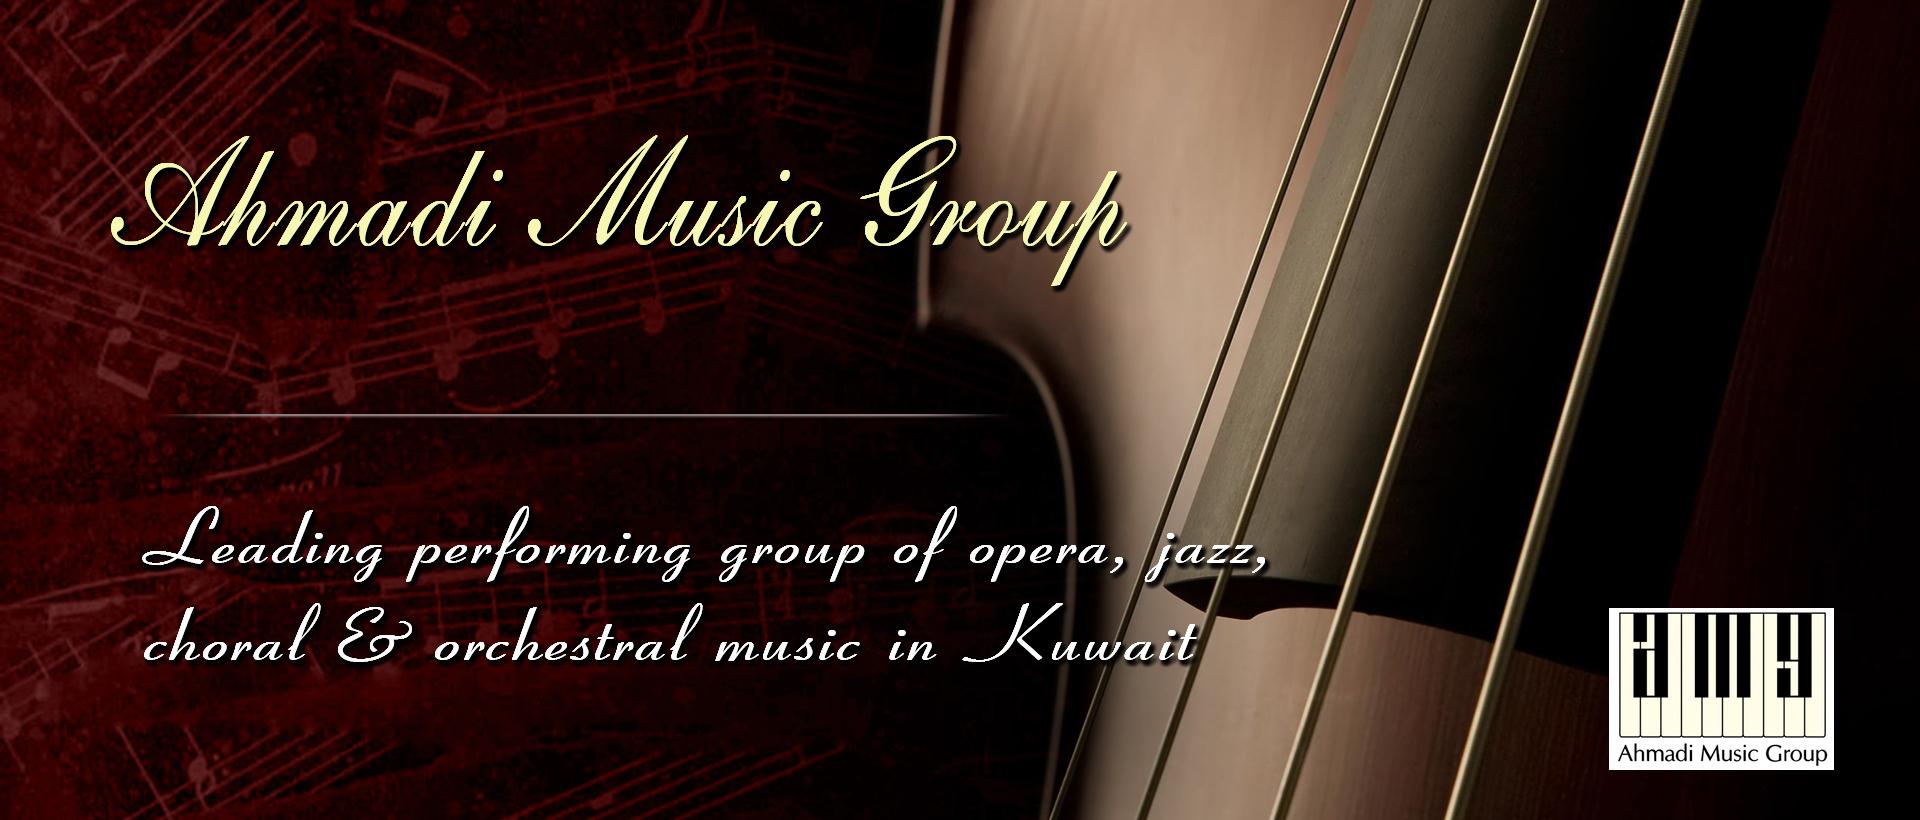 Sing with the Ahmadi Music Group Choir